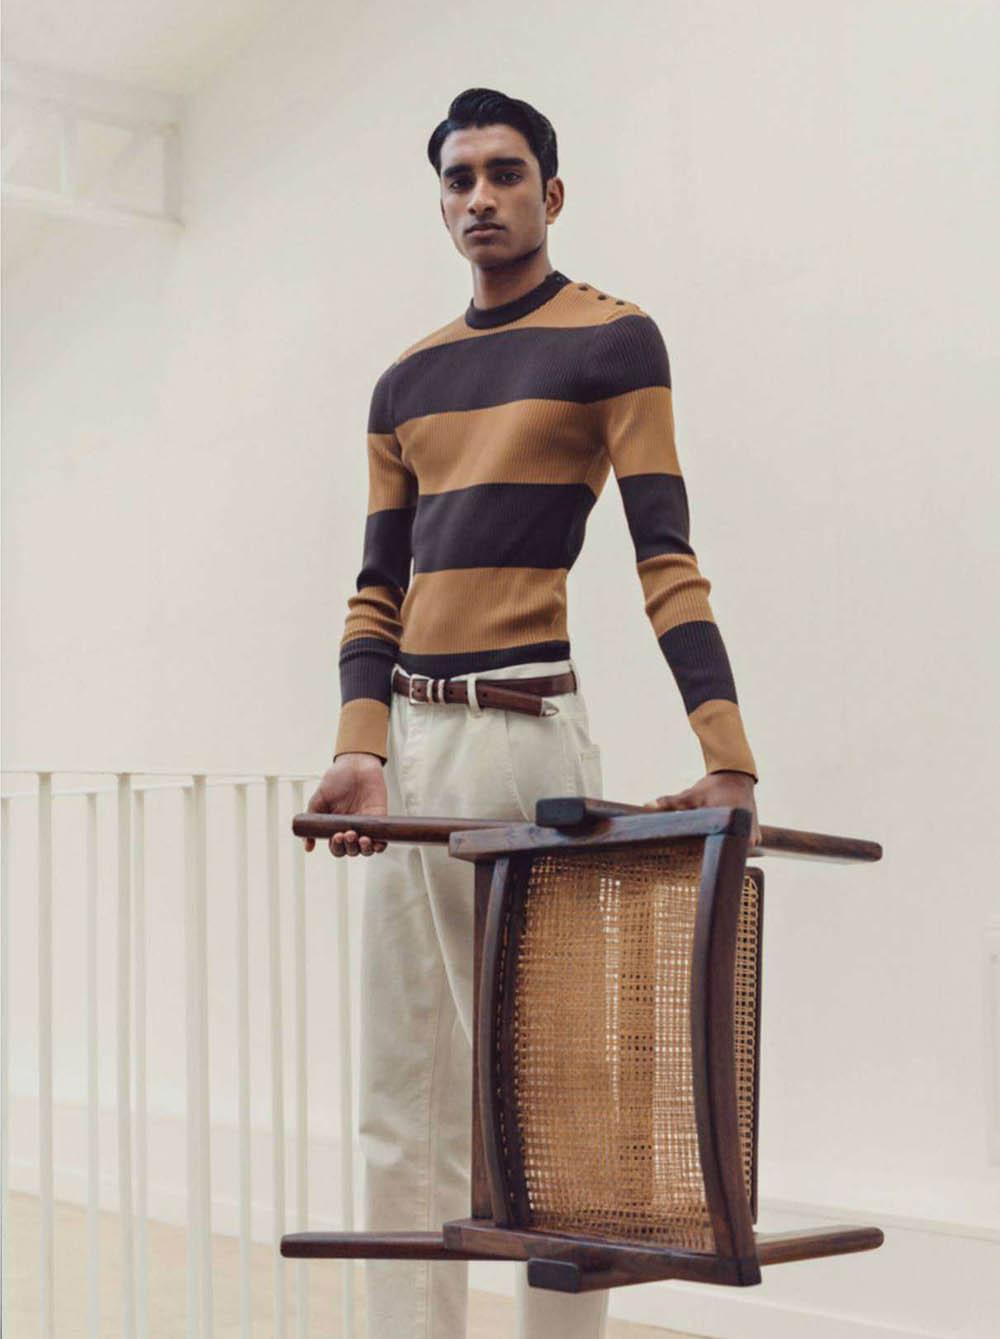 Jeenu Mahadevan by Dham Srifuengfung for GQ France April 2019